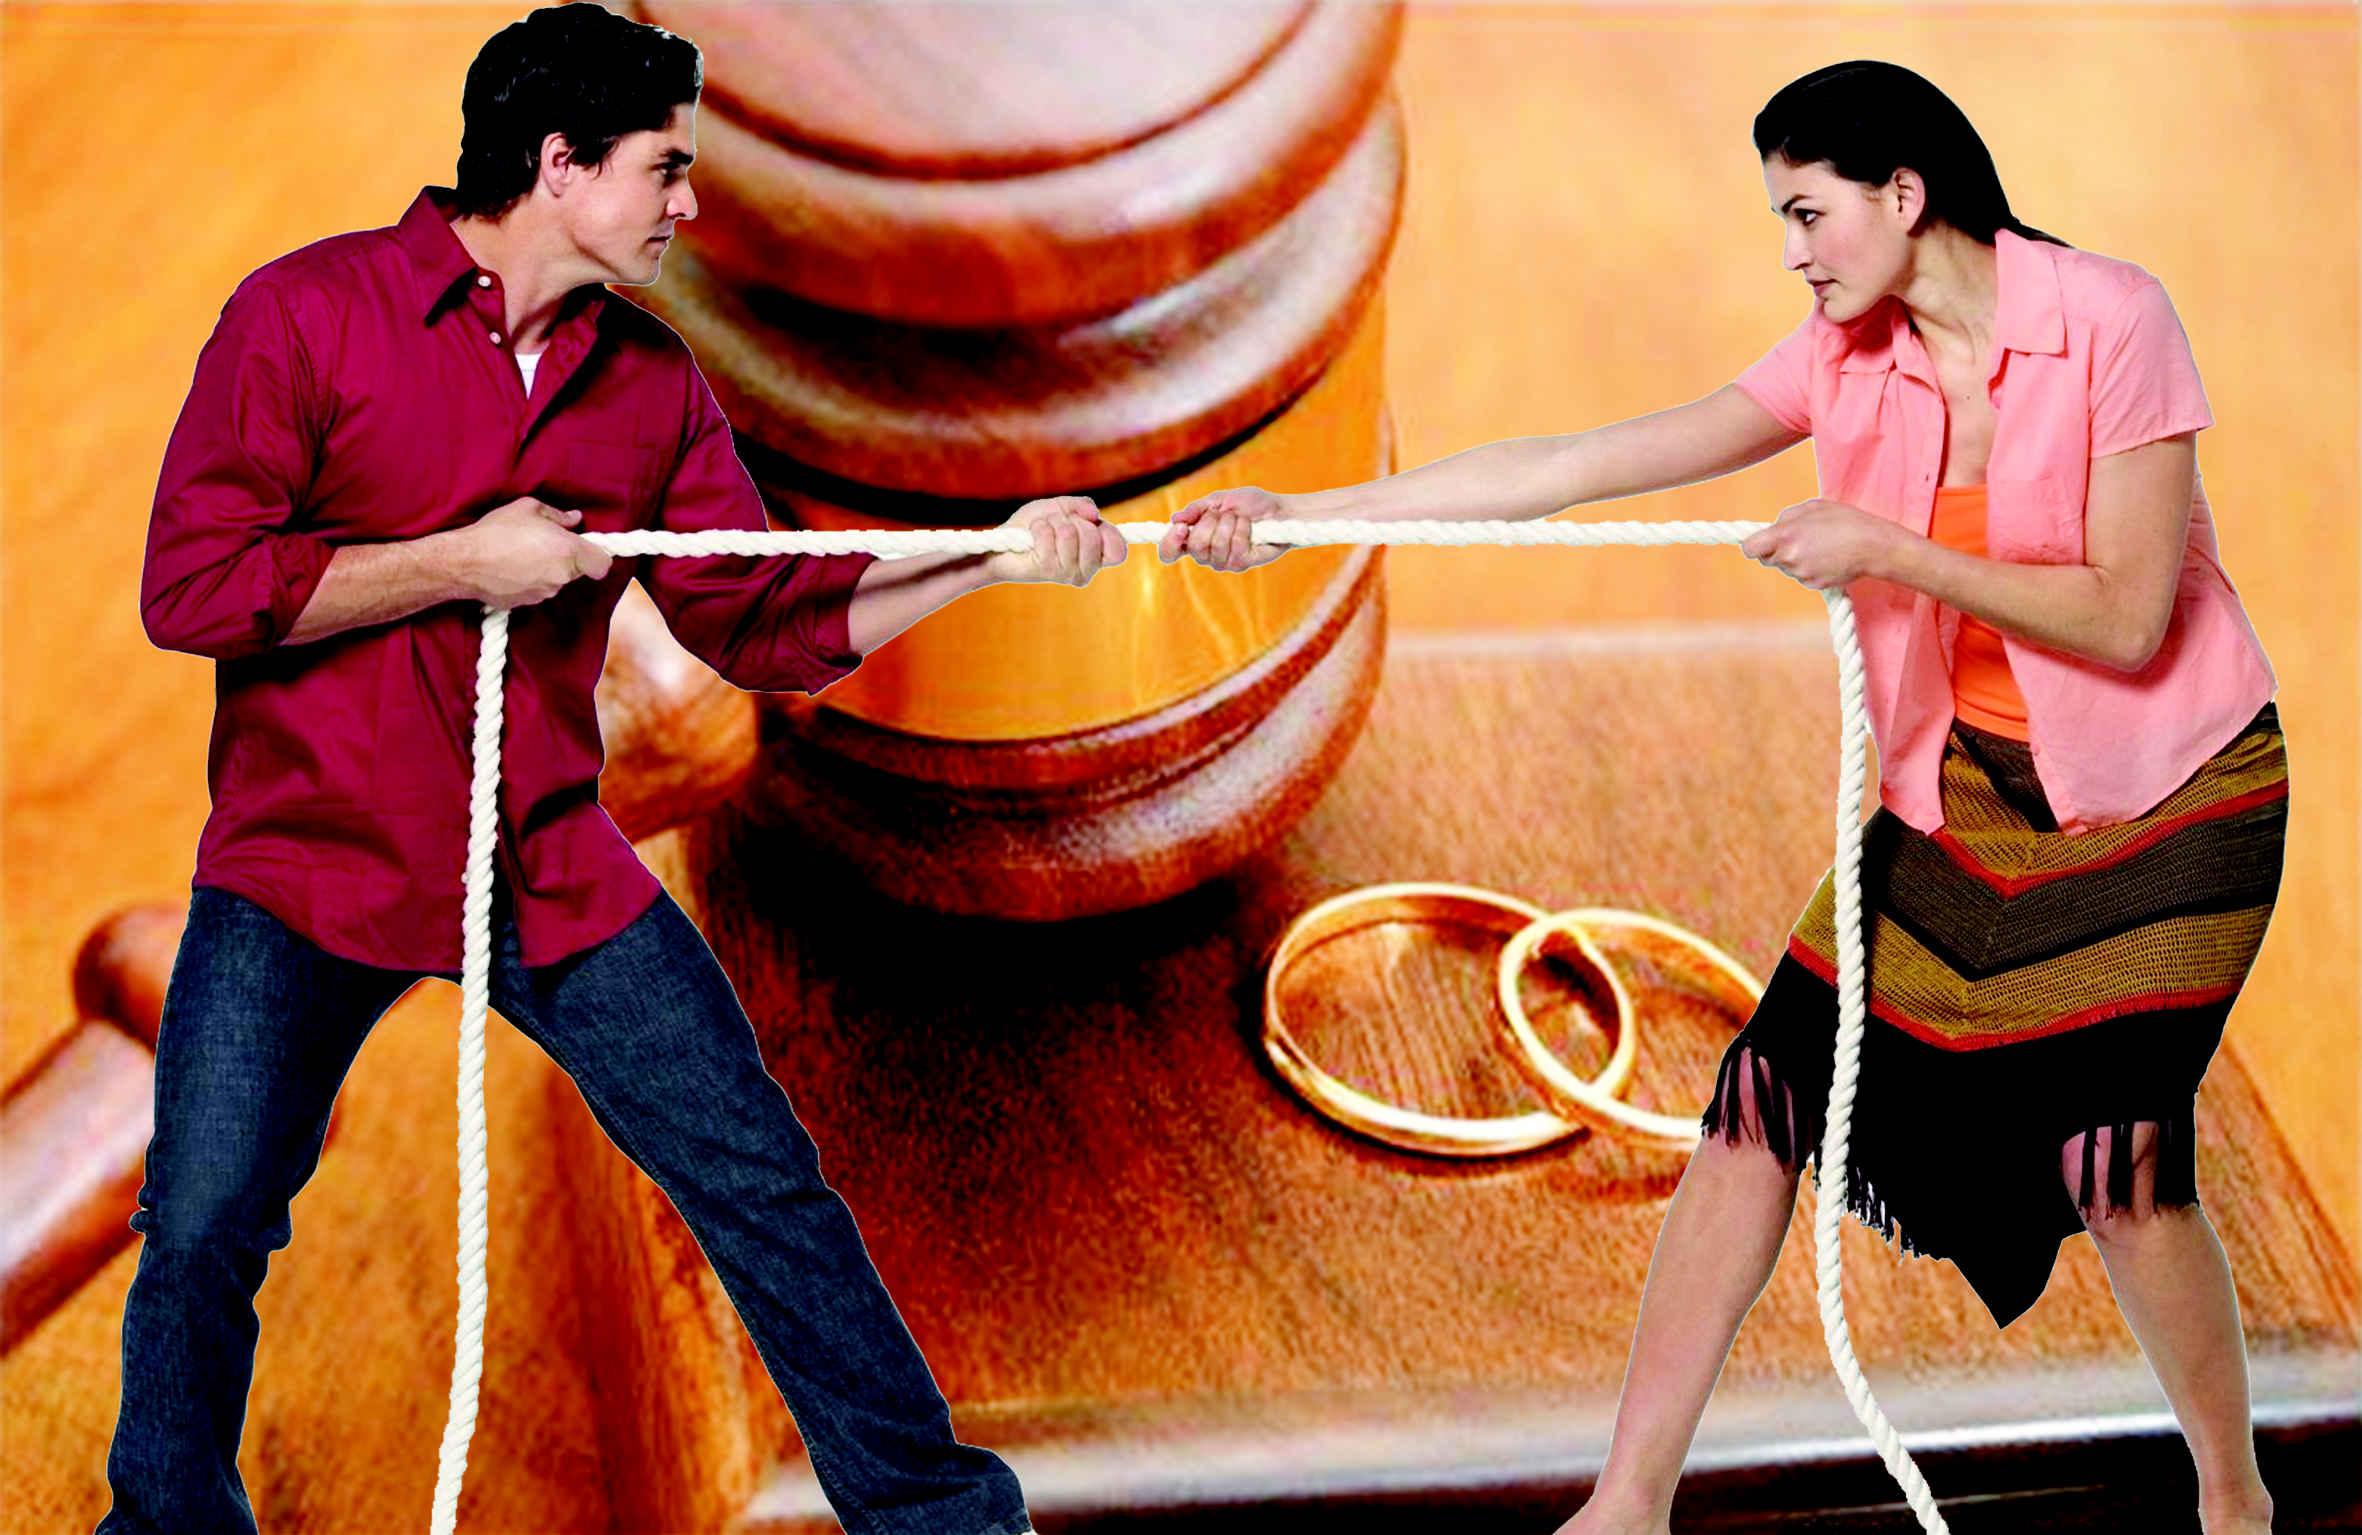 Развод без присутствия одного из супругов в суде или ЗАГСе